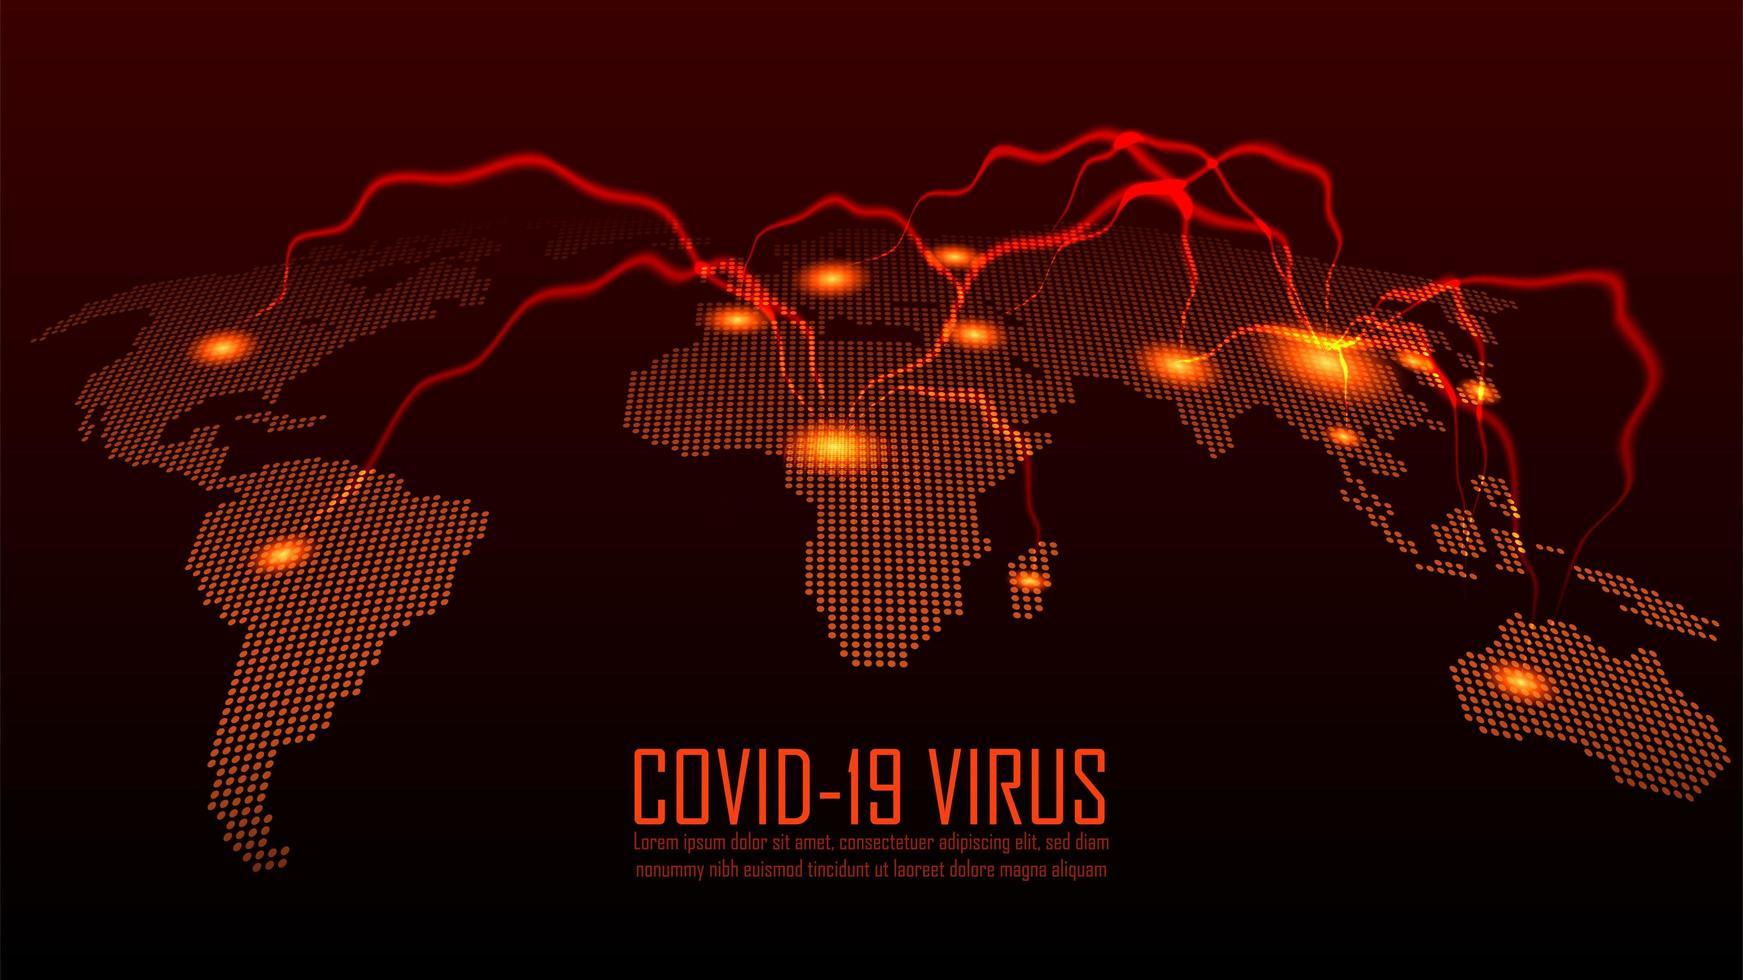 surto de coronavírus em todo o mundo design vetor